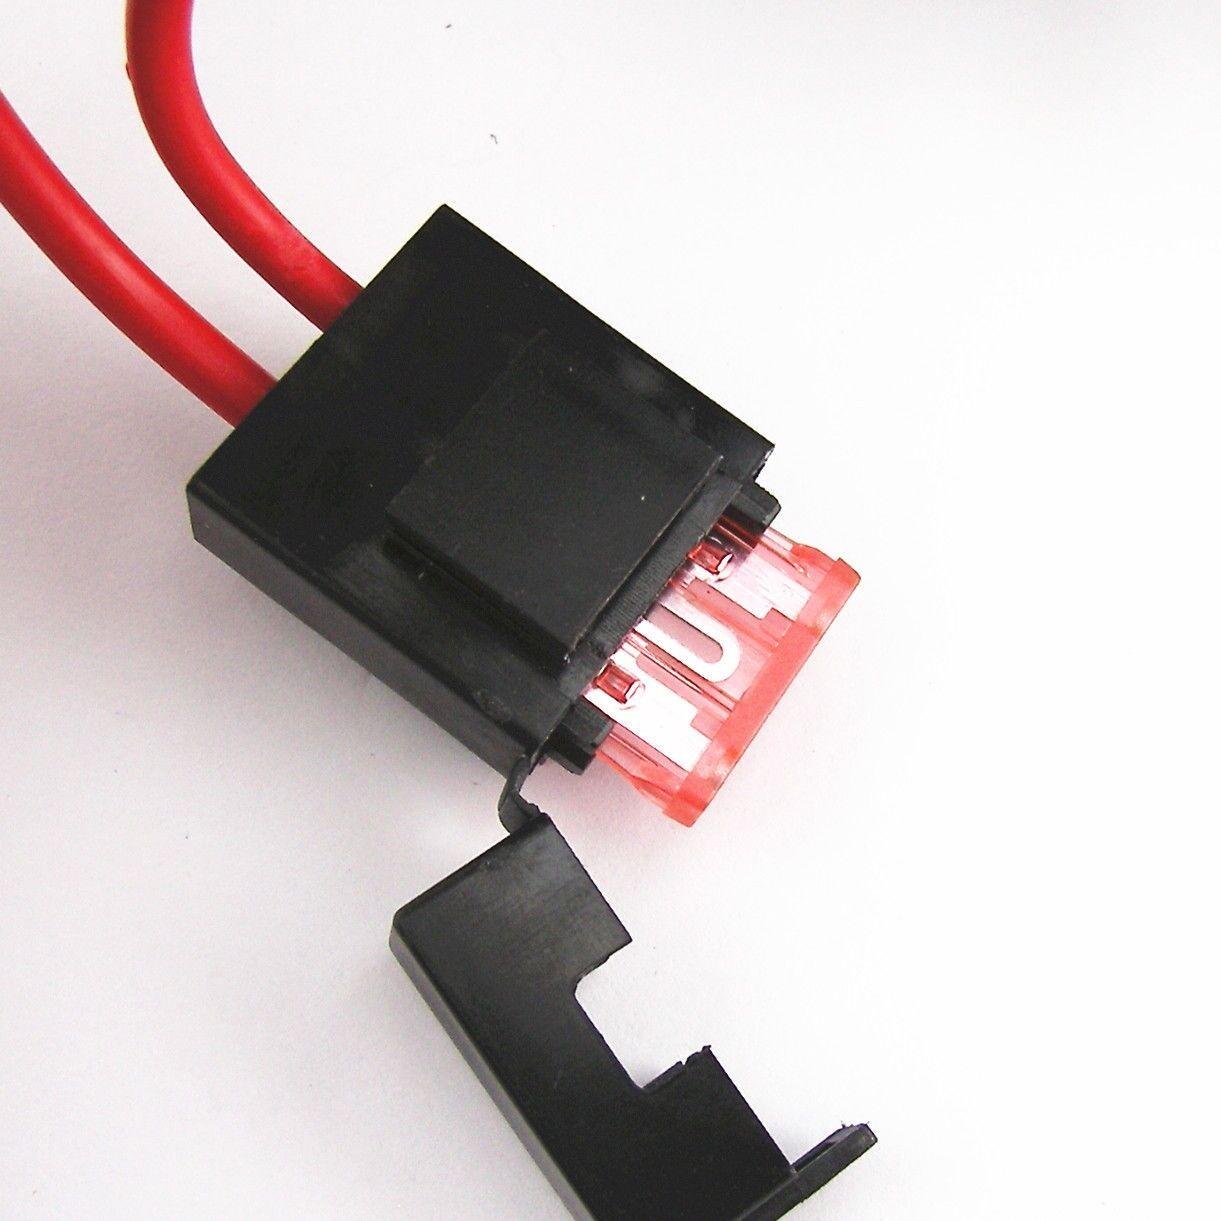 H4 H6054st Headlight Relay Wiring Harness 4 Headlamp Light Bulb 3 Of 12 Kit H6054